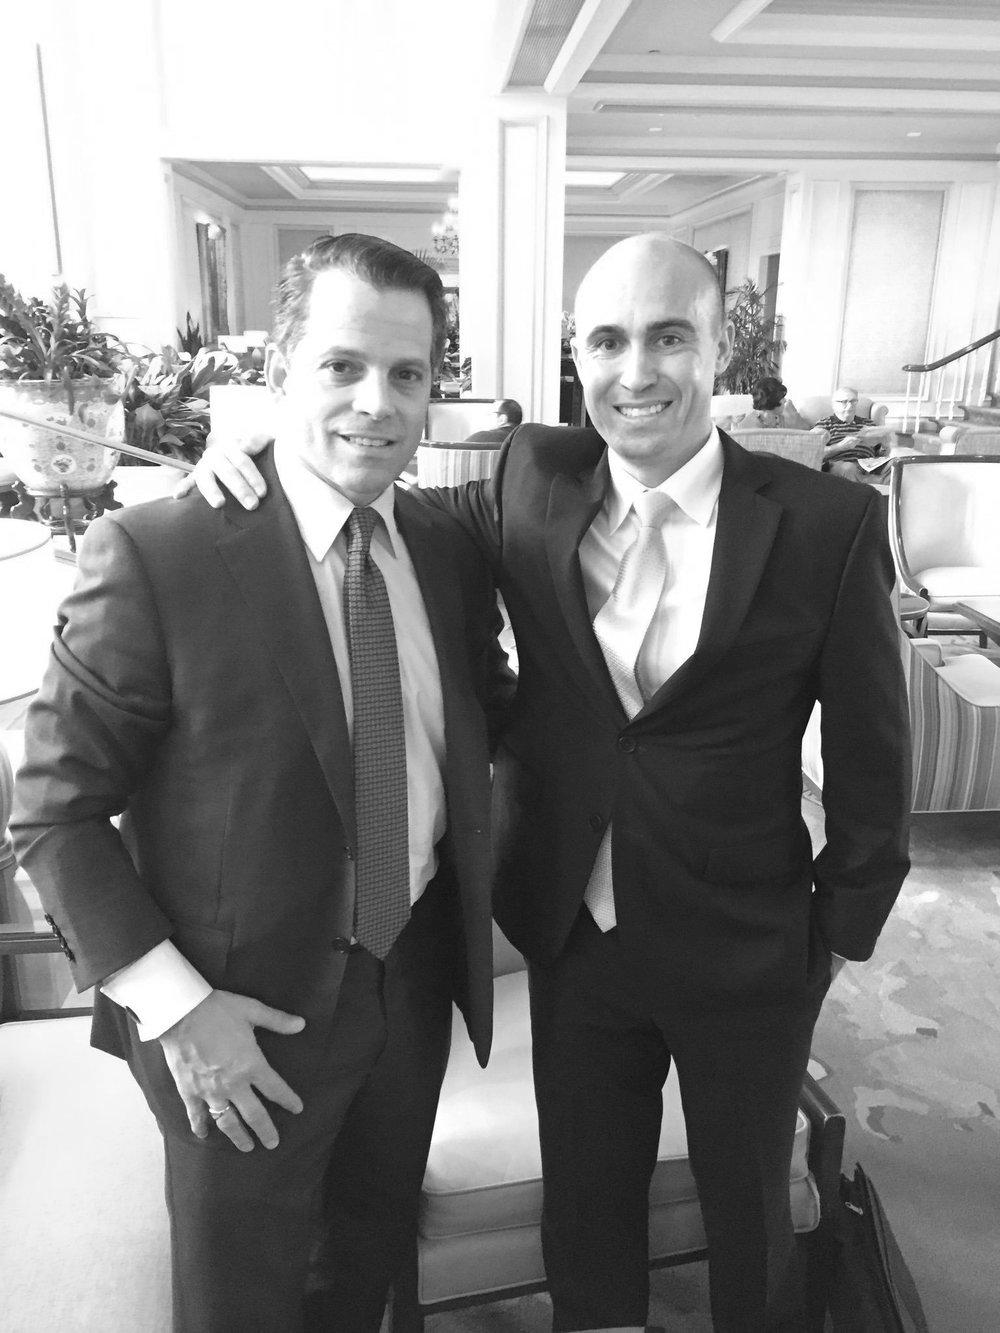 Anthony Scaramucci, Founder, SkyBridge Capital